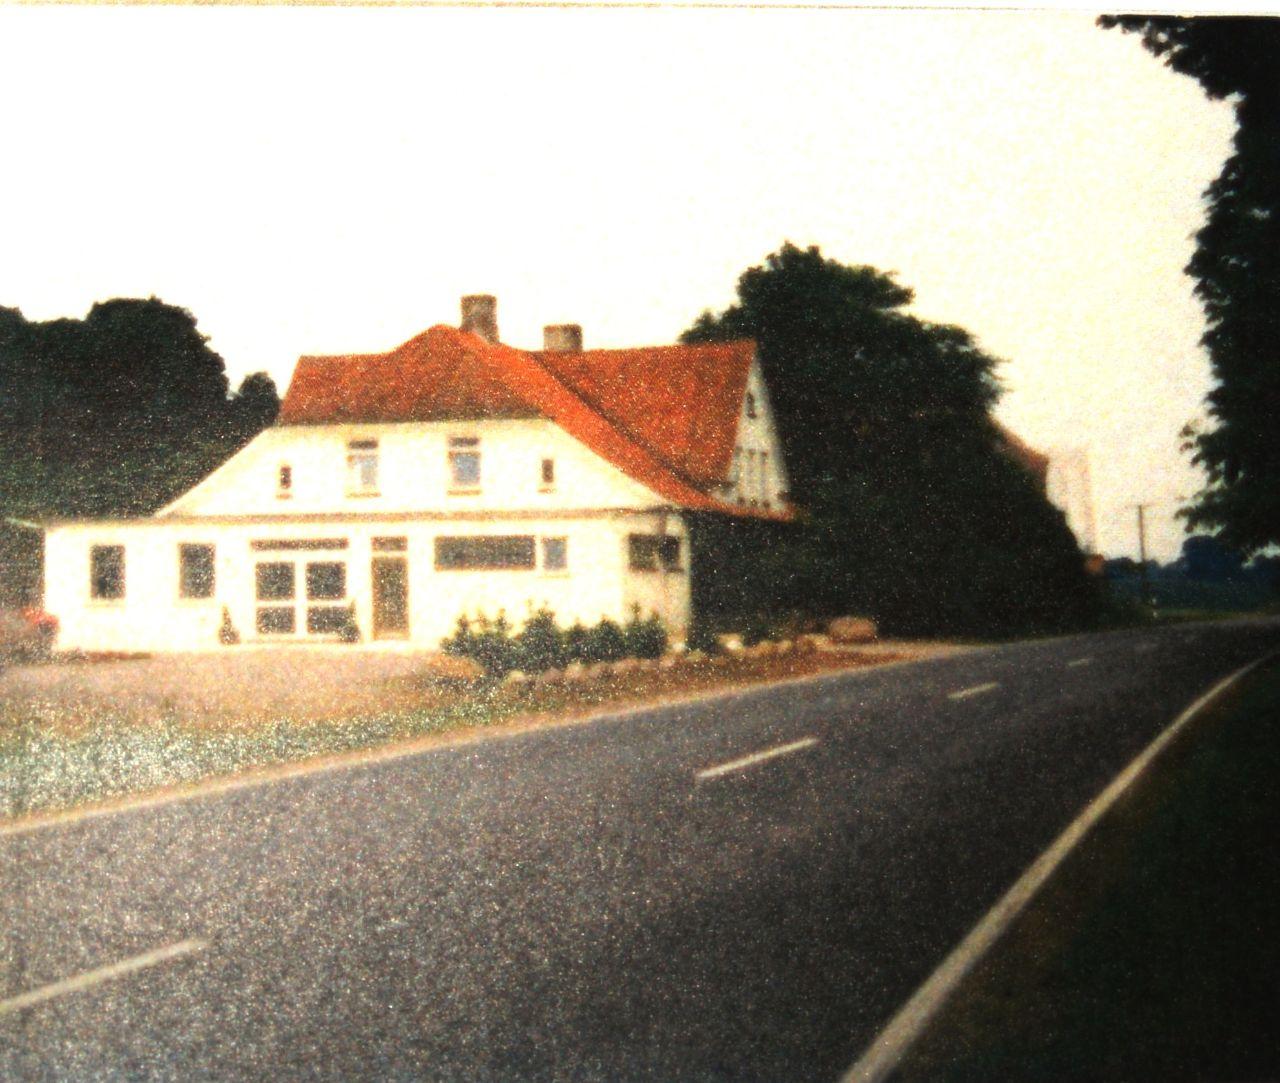 Bundhorst Nr. 5